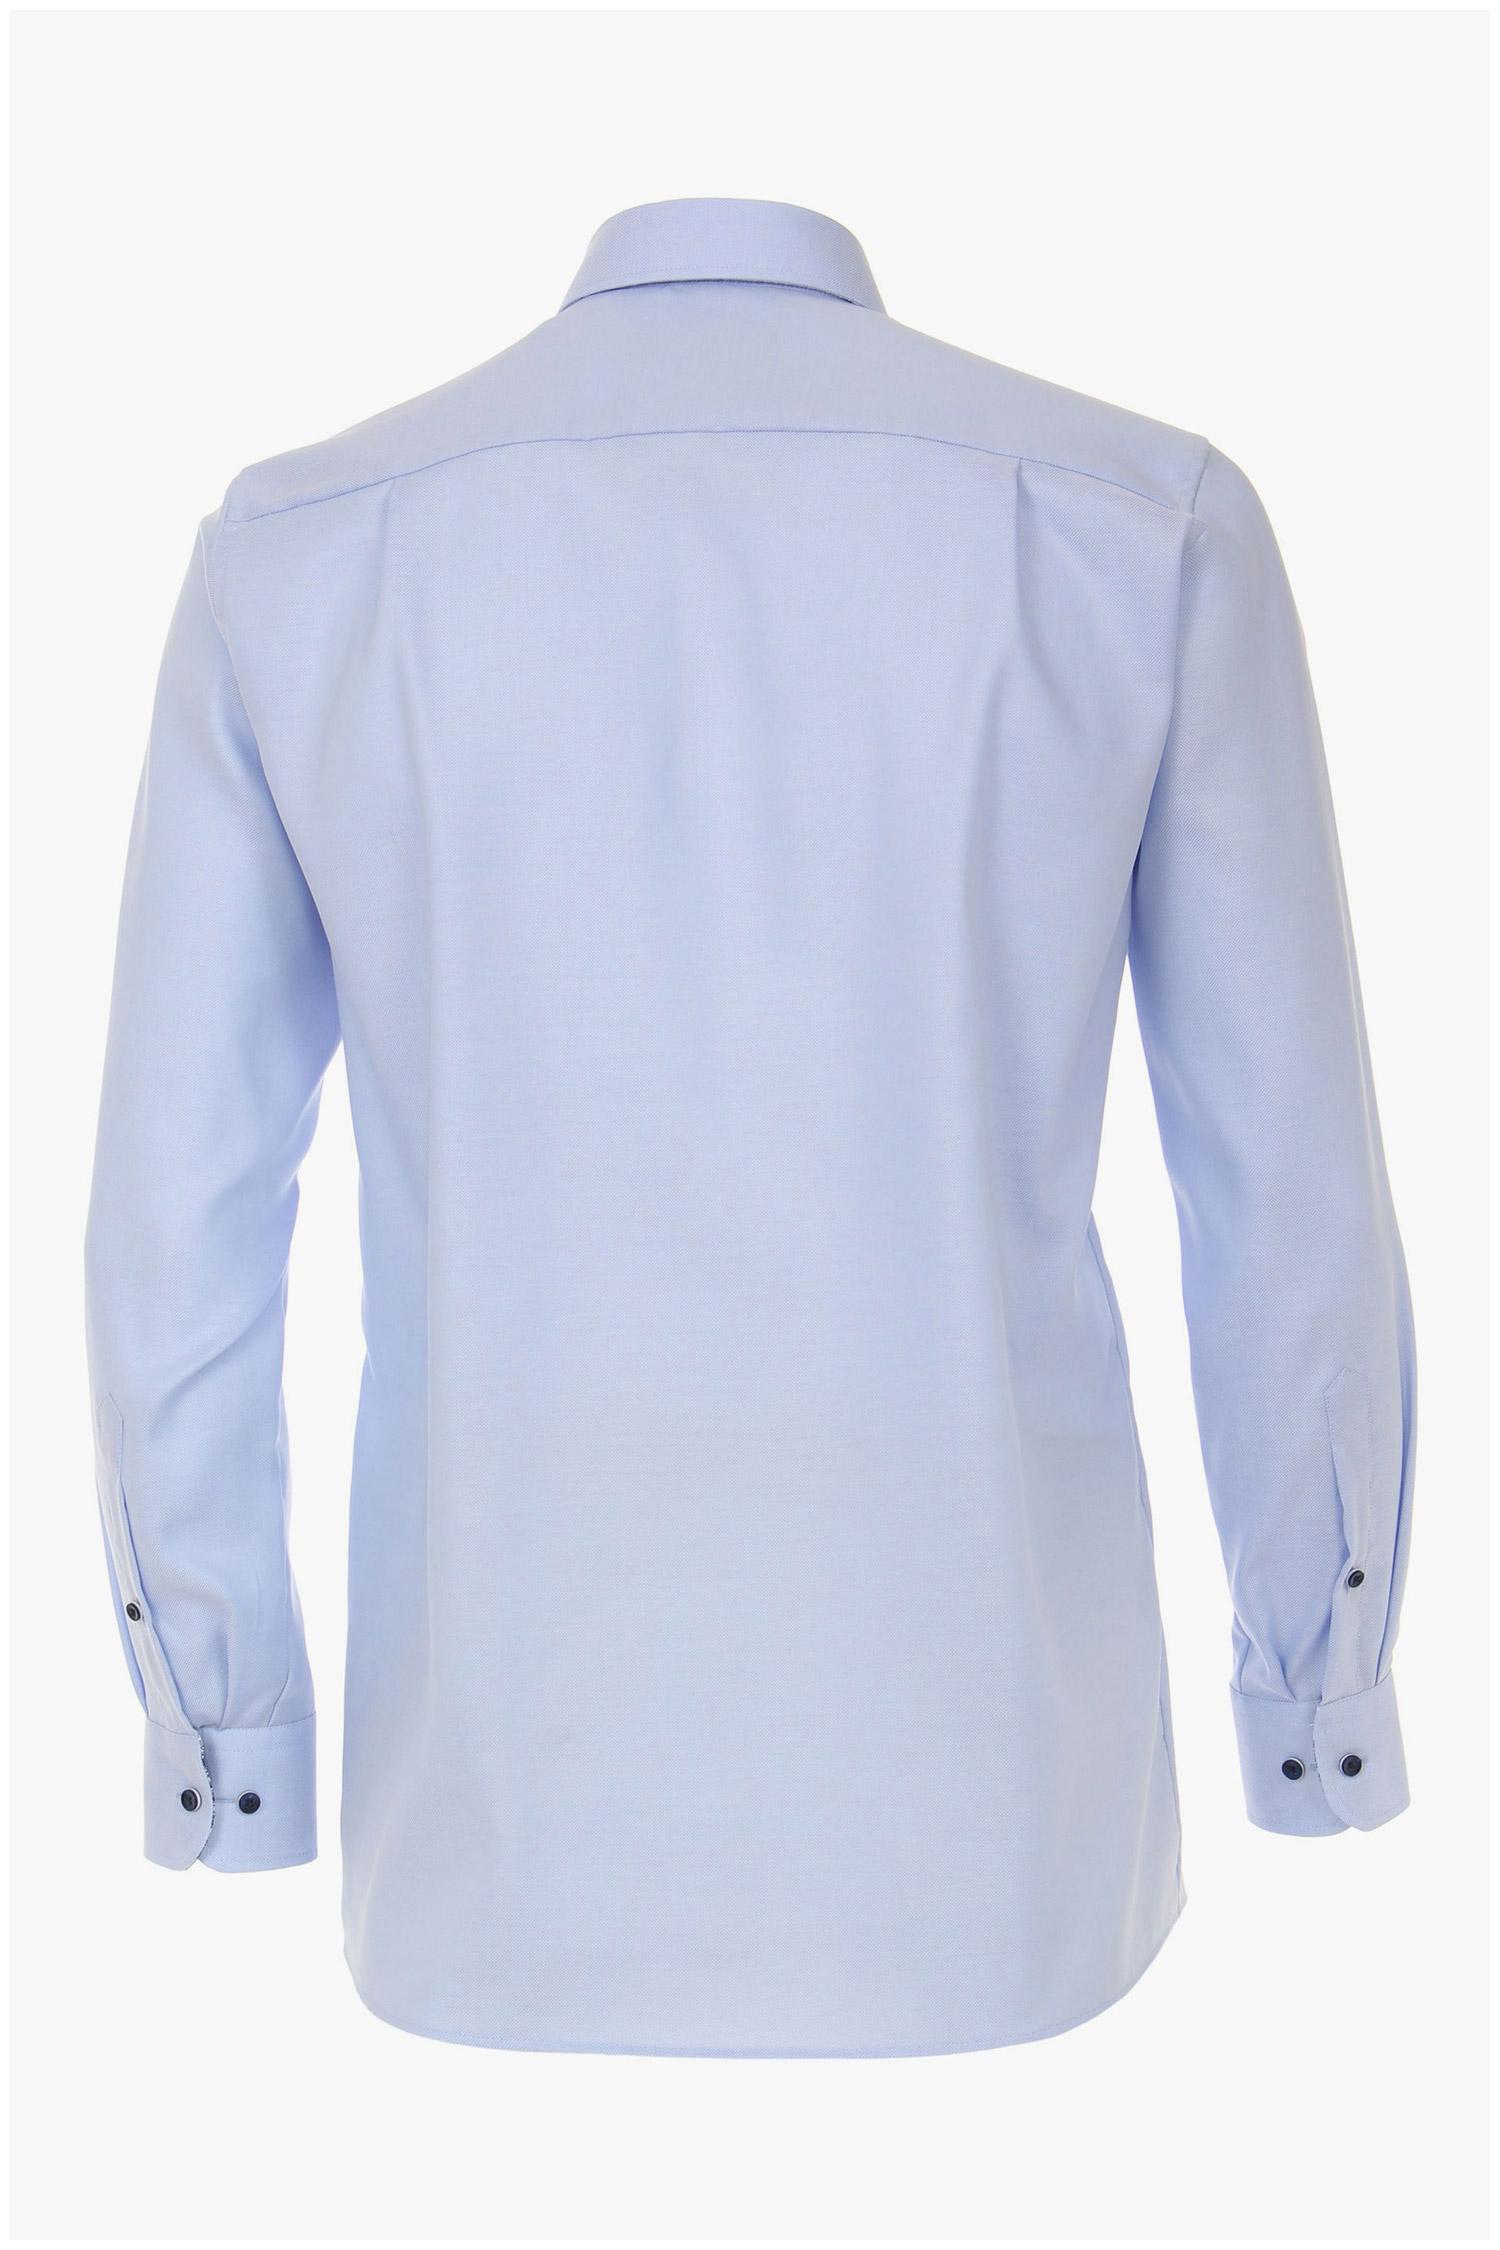 Camisas, Vestir Manga Larga, 110243, CELESTE | Zoom